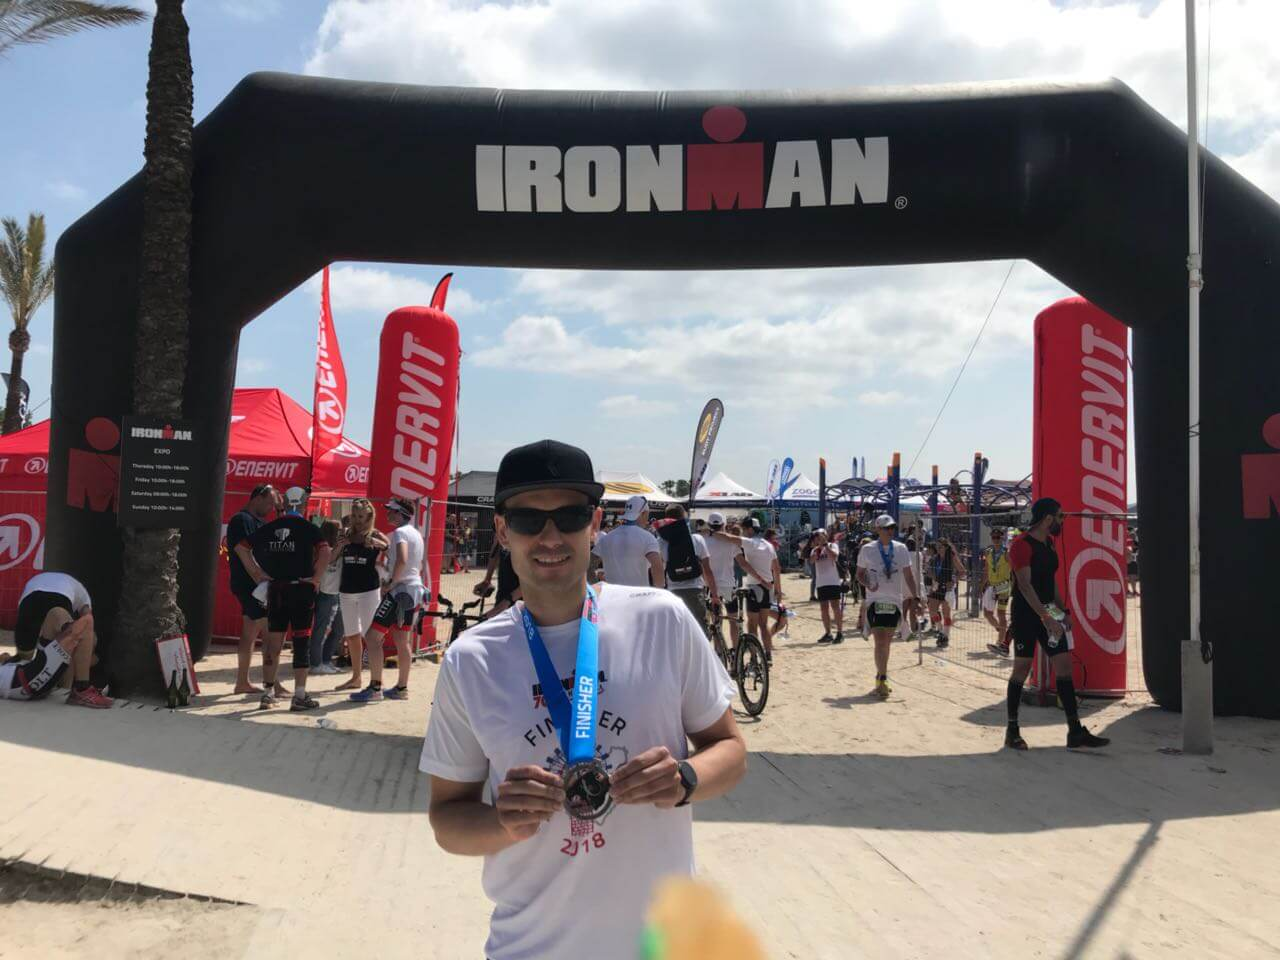 Daniel-Marx-Triathlon-Blog-Ironman-70.3-Mallorca